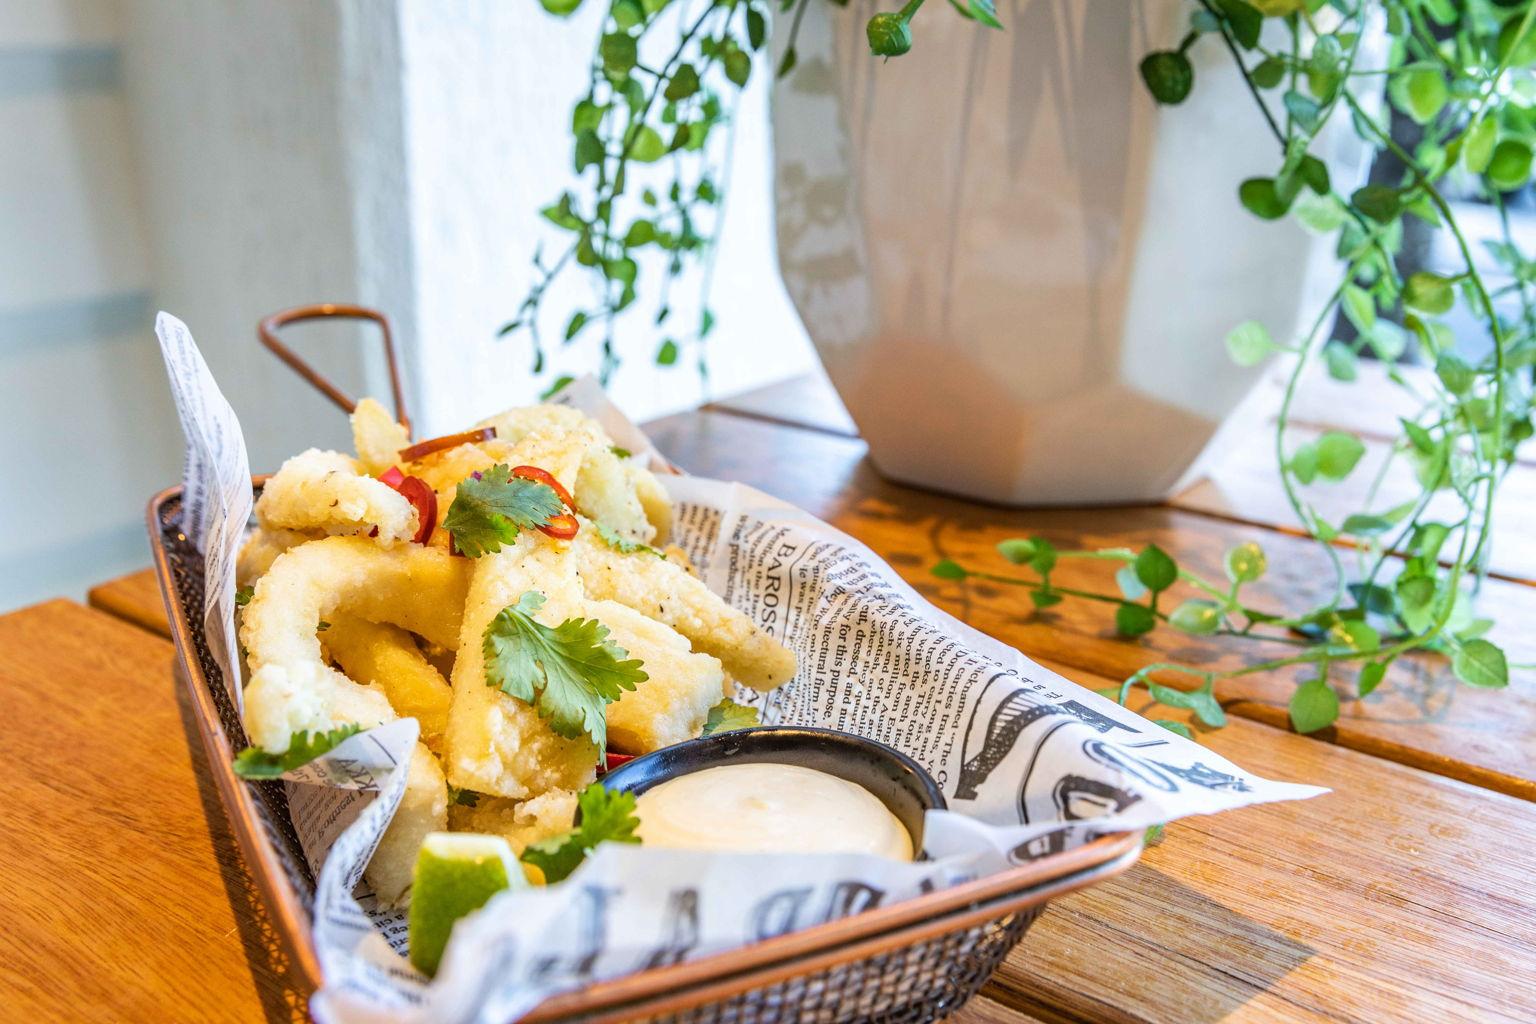 victoria-inn-food (2).jpg